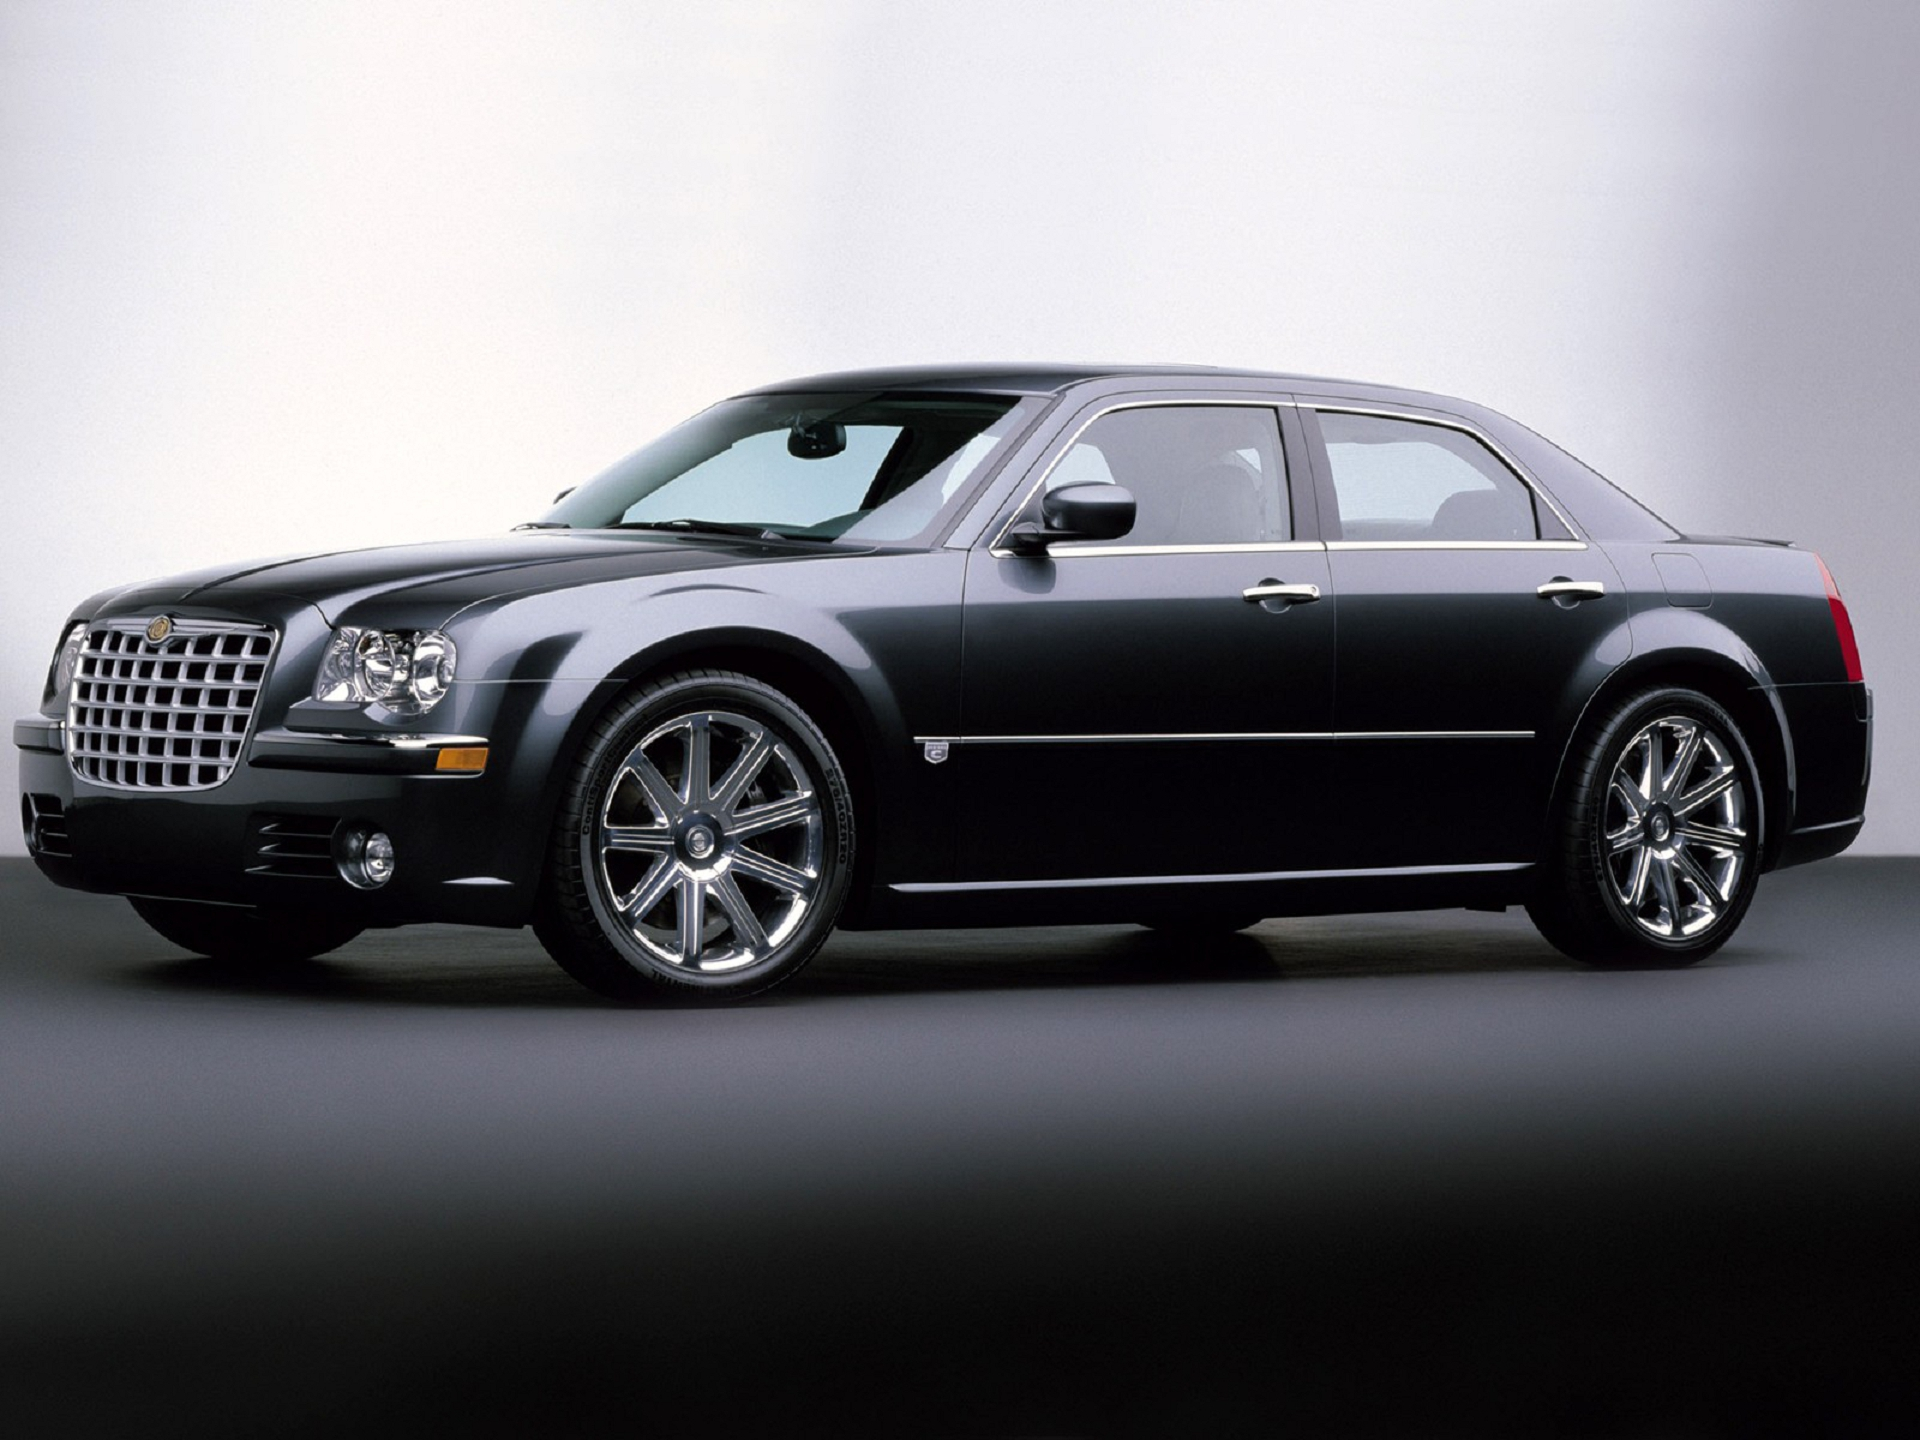 Chrysler 300 Hd Background